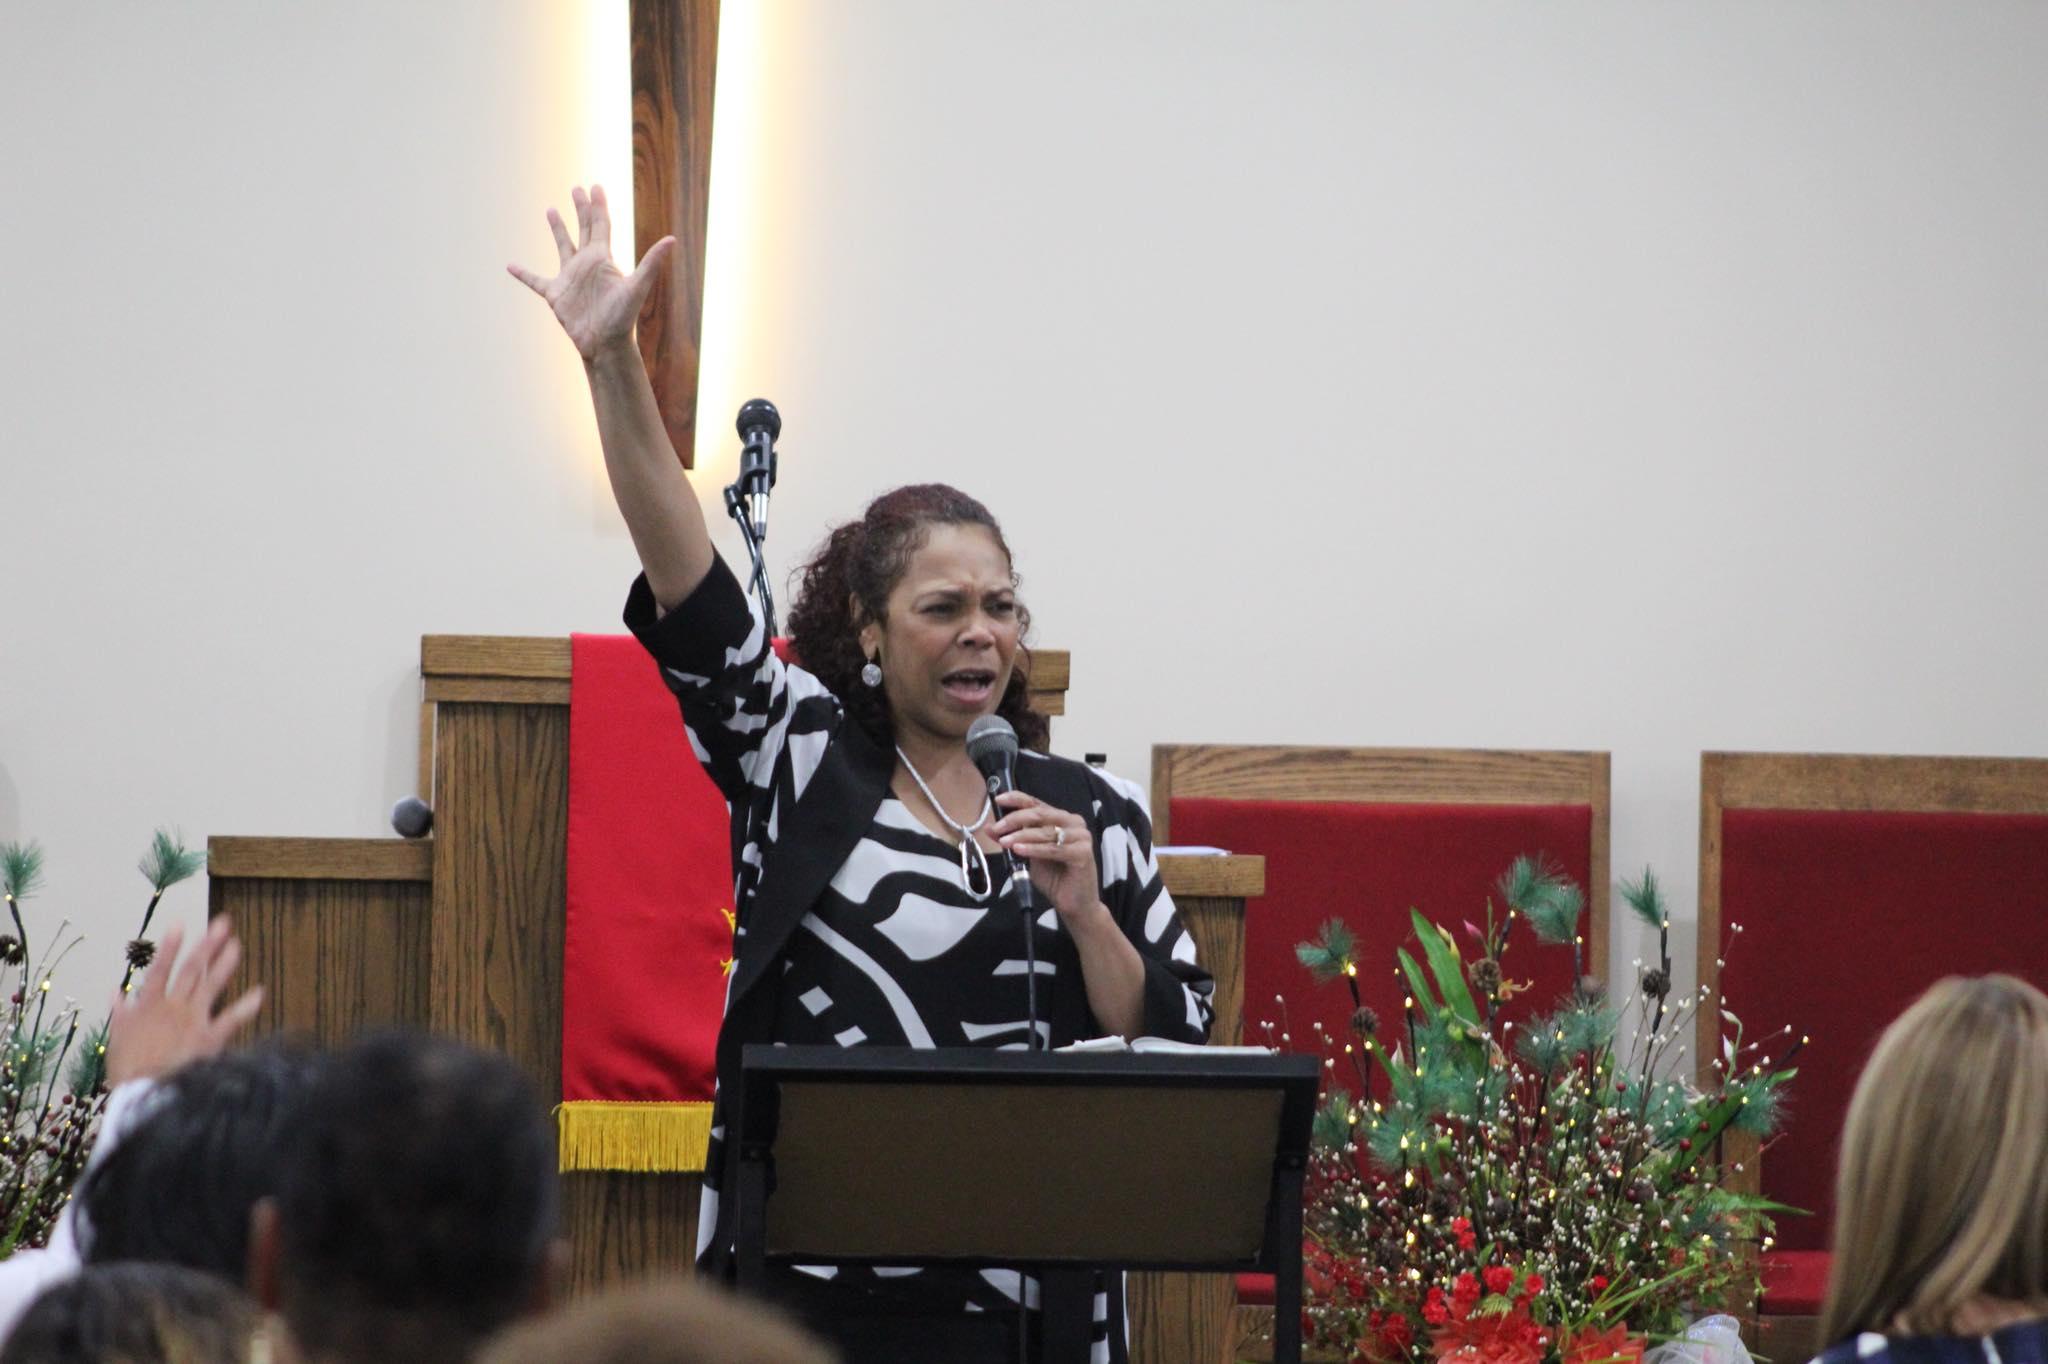 Dr. Brenda Alton